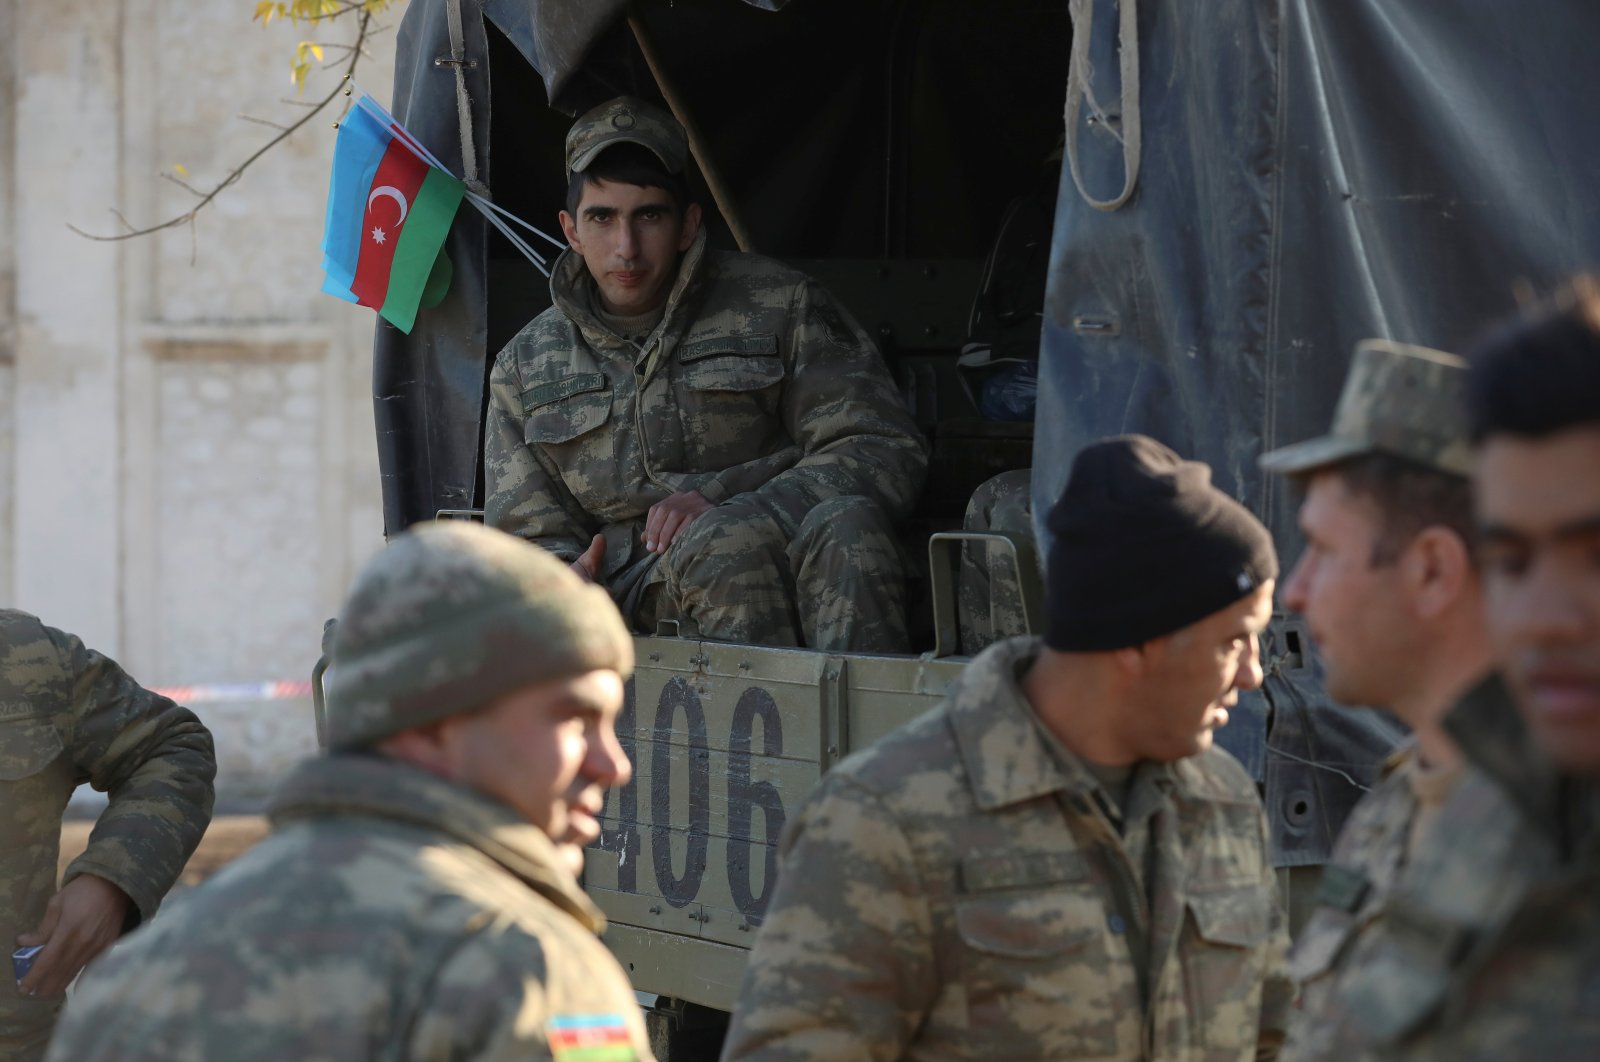 Azerbaijani service members gather in Agdam town in the region of Nagorno-Karabakh, Nov. 24, 2020. (REUTERS)